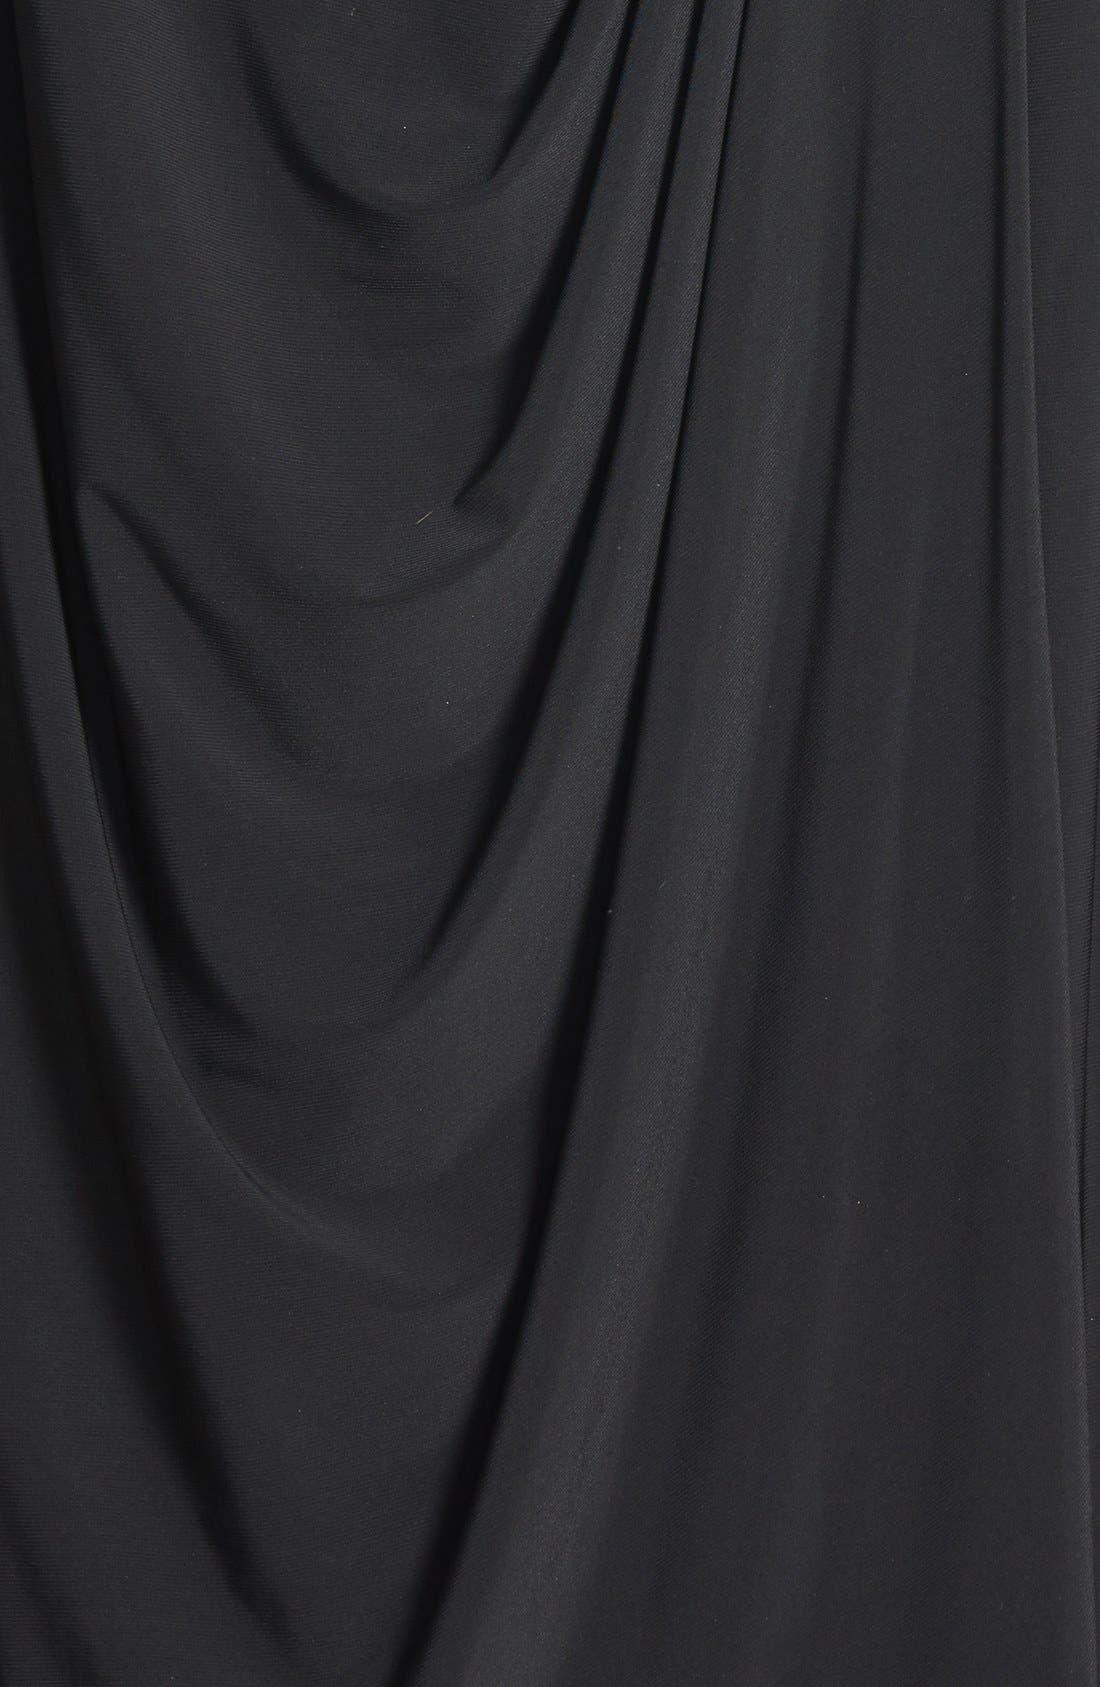 Alternate Image 3  - Alex Evenings Embellished Portrait Collar Cocktail Dress (Plus Size)